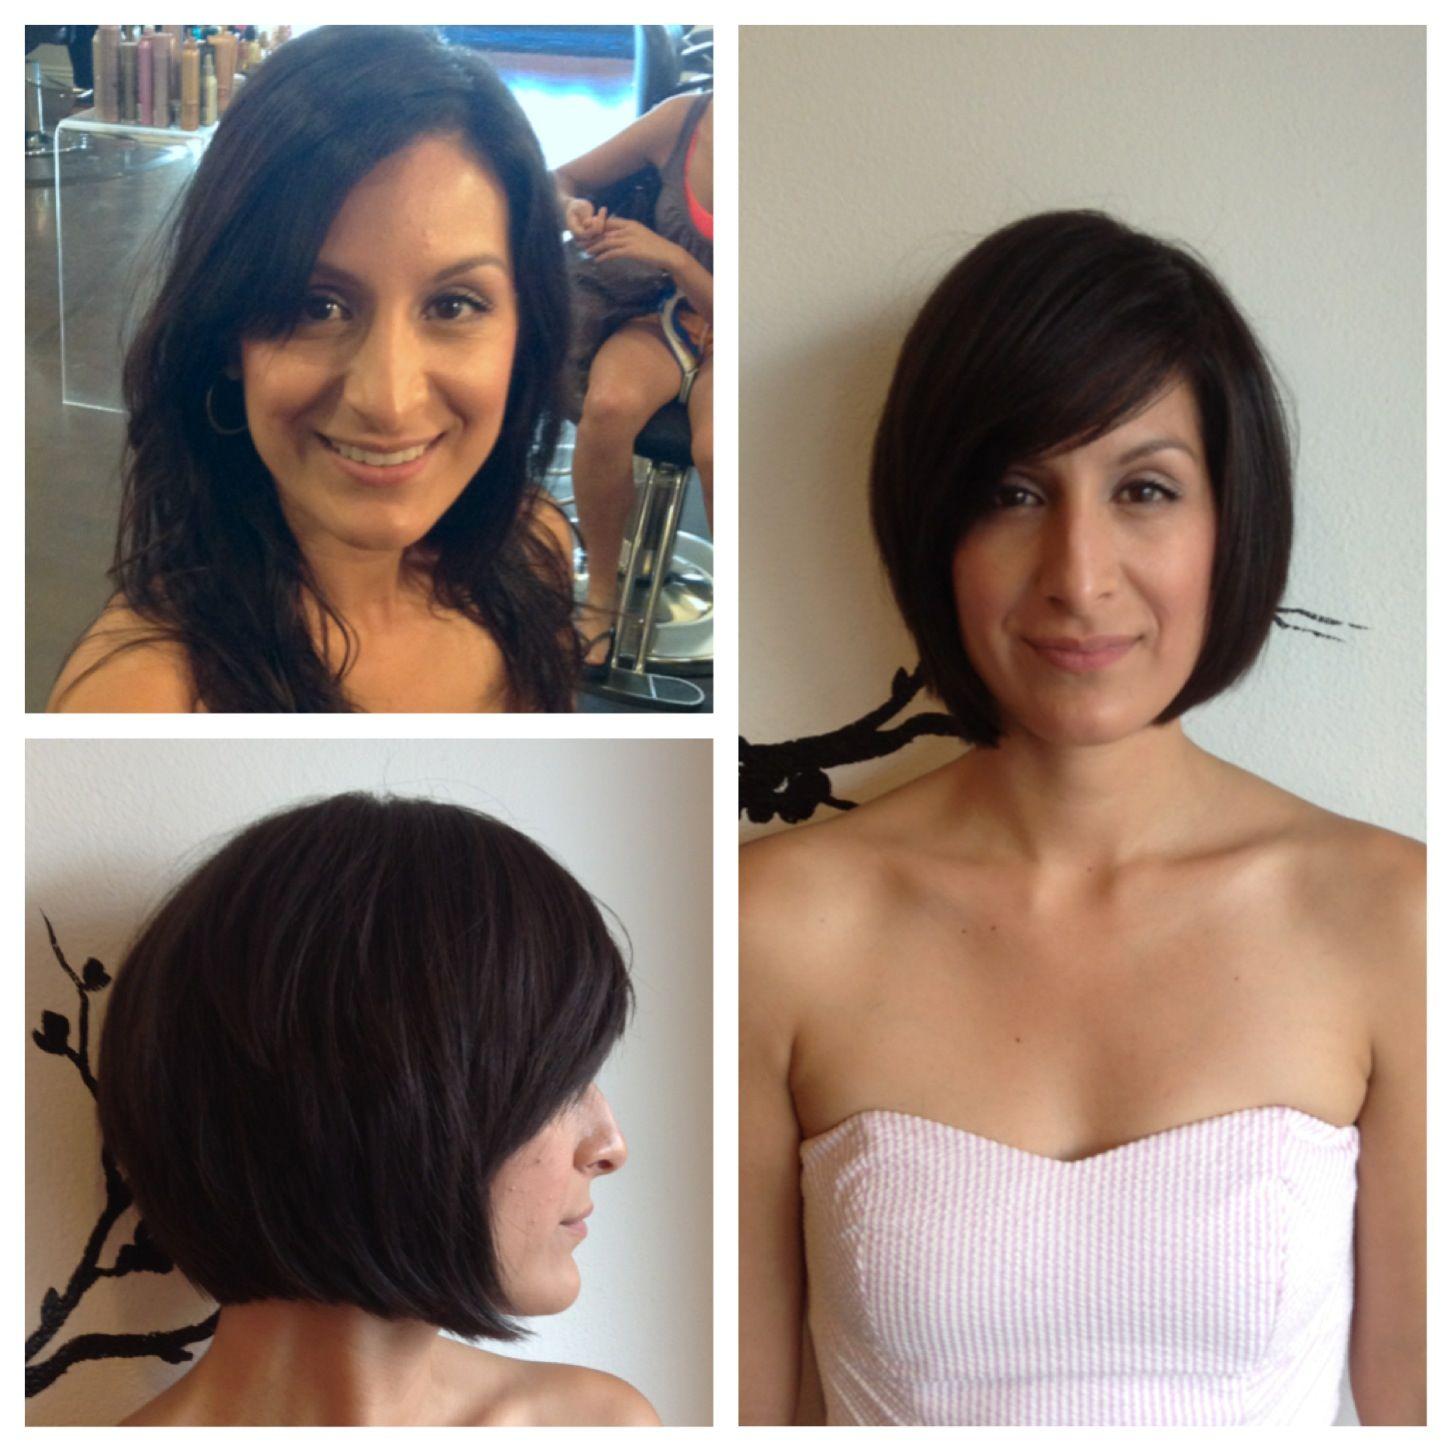 Before and after bob haircut - Before And After Bob Haircut By Us. Pinterest Haircuts, Bobs